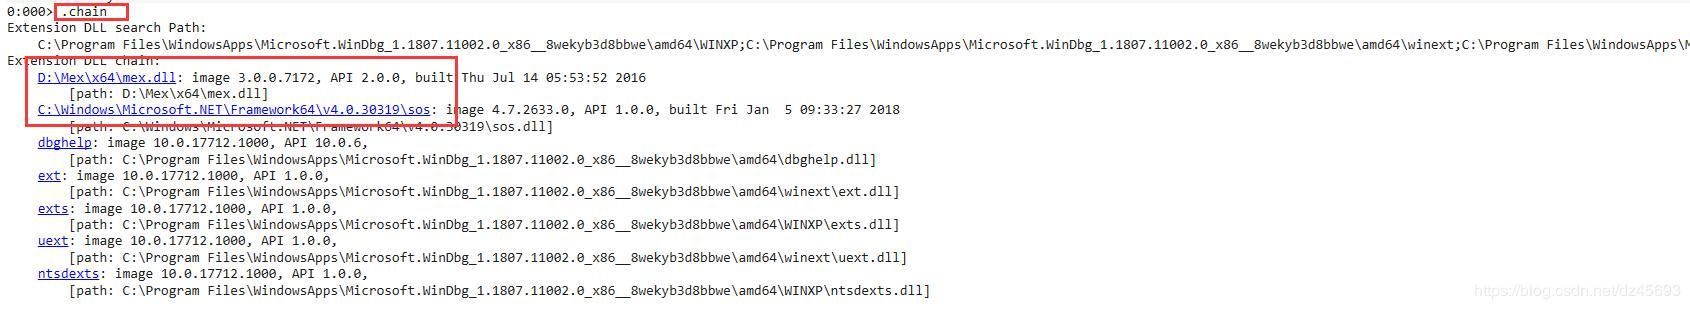 Windbg Program Debugging Series 1 - Common Command